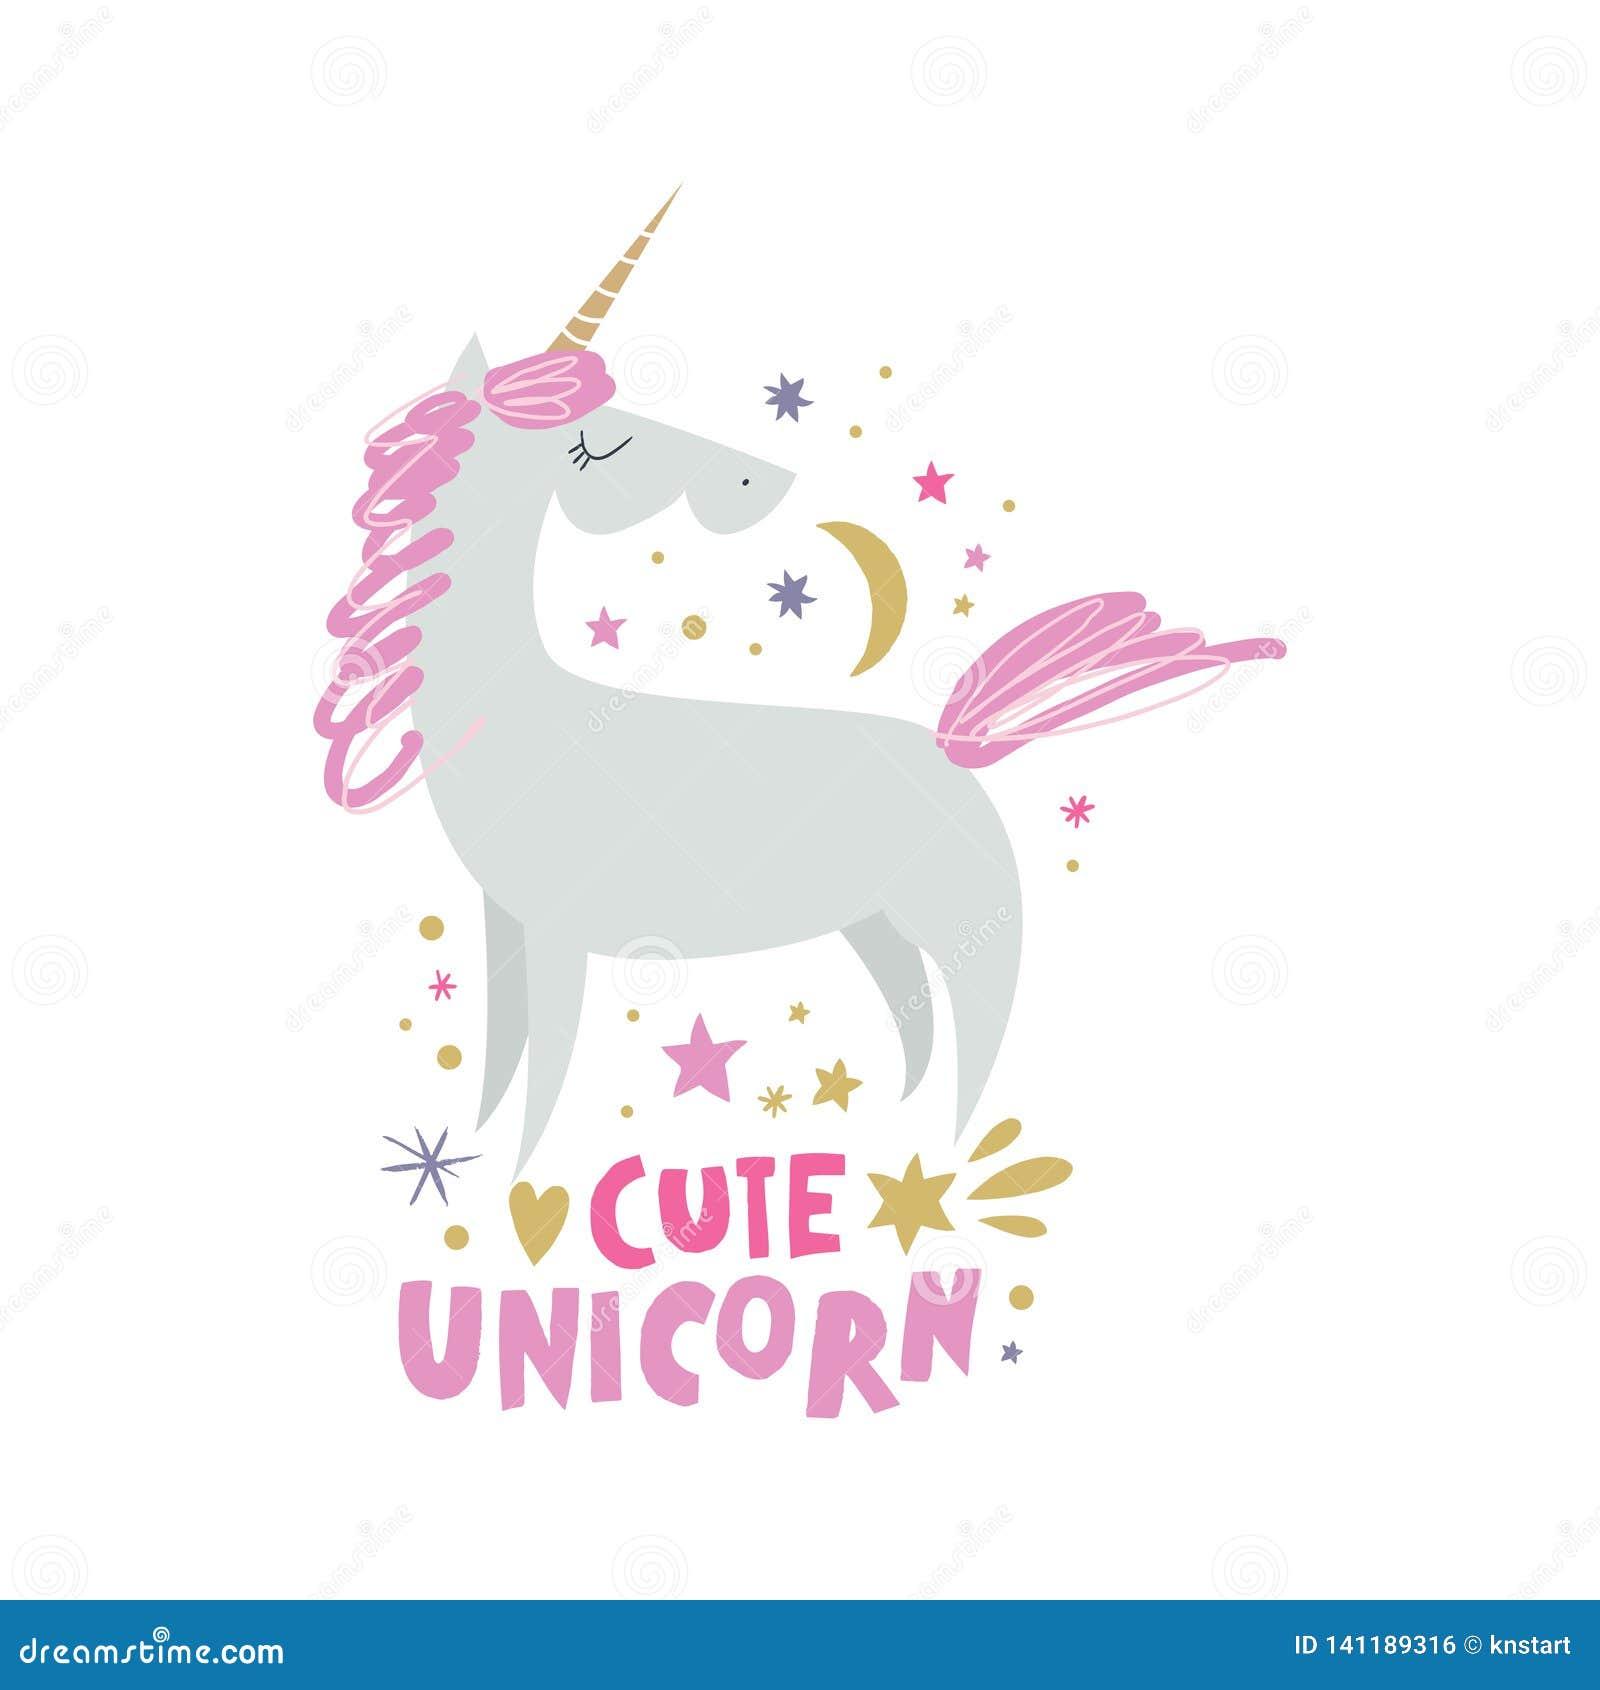 Unicorn Nursery Wall Art, Animal Prints, Baby Room ...